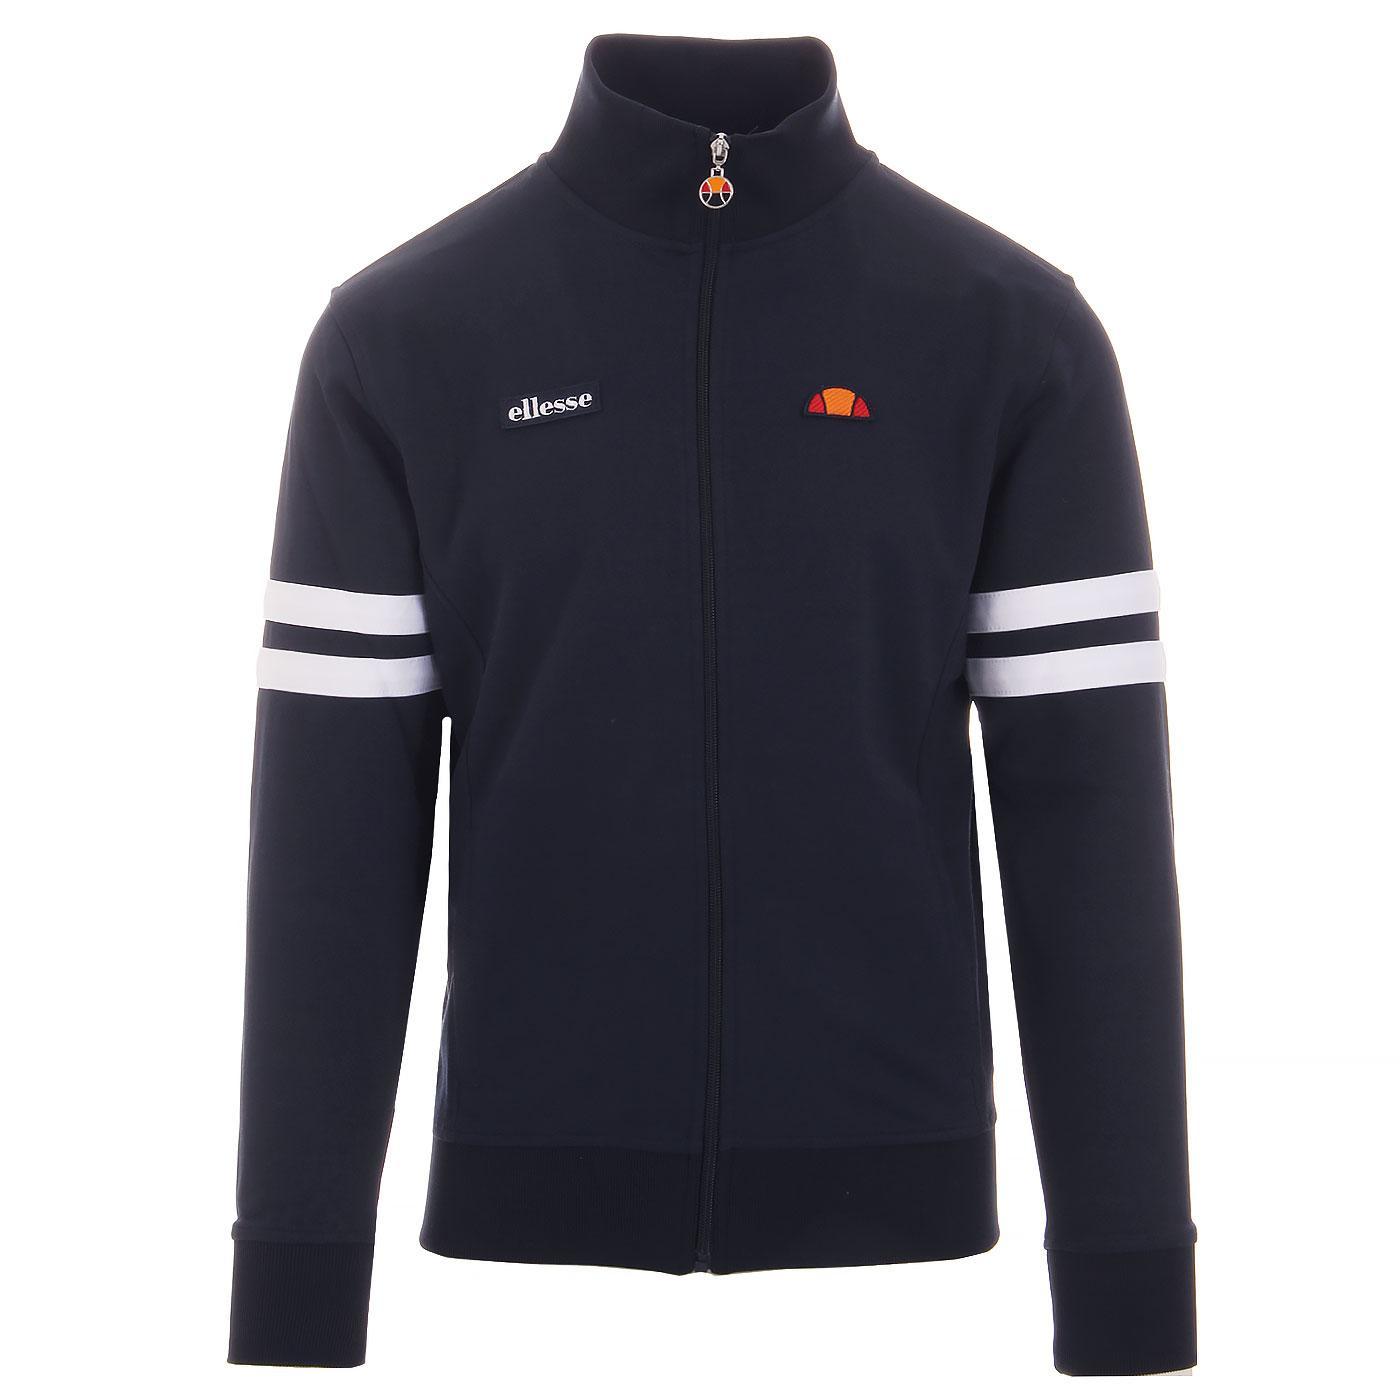 Roma ELLESSE Men's Seventies Track Jacket -  NAVY